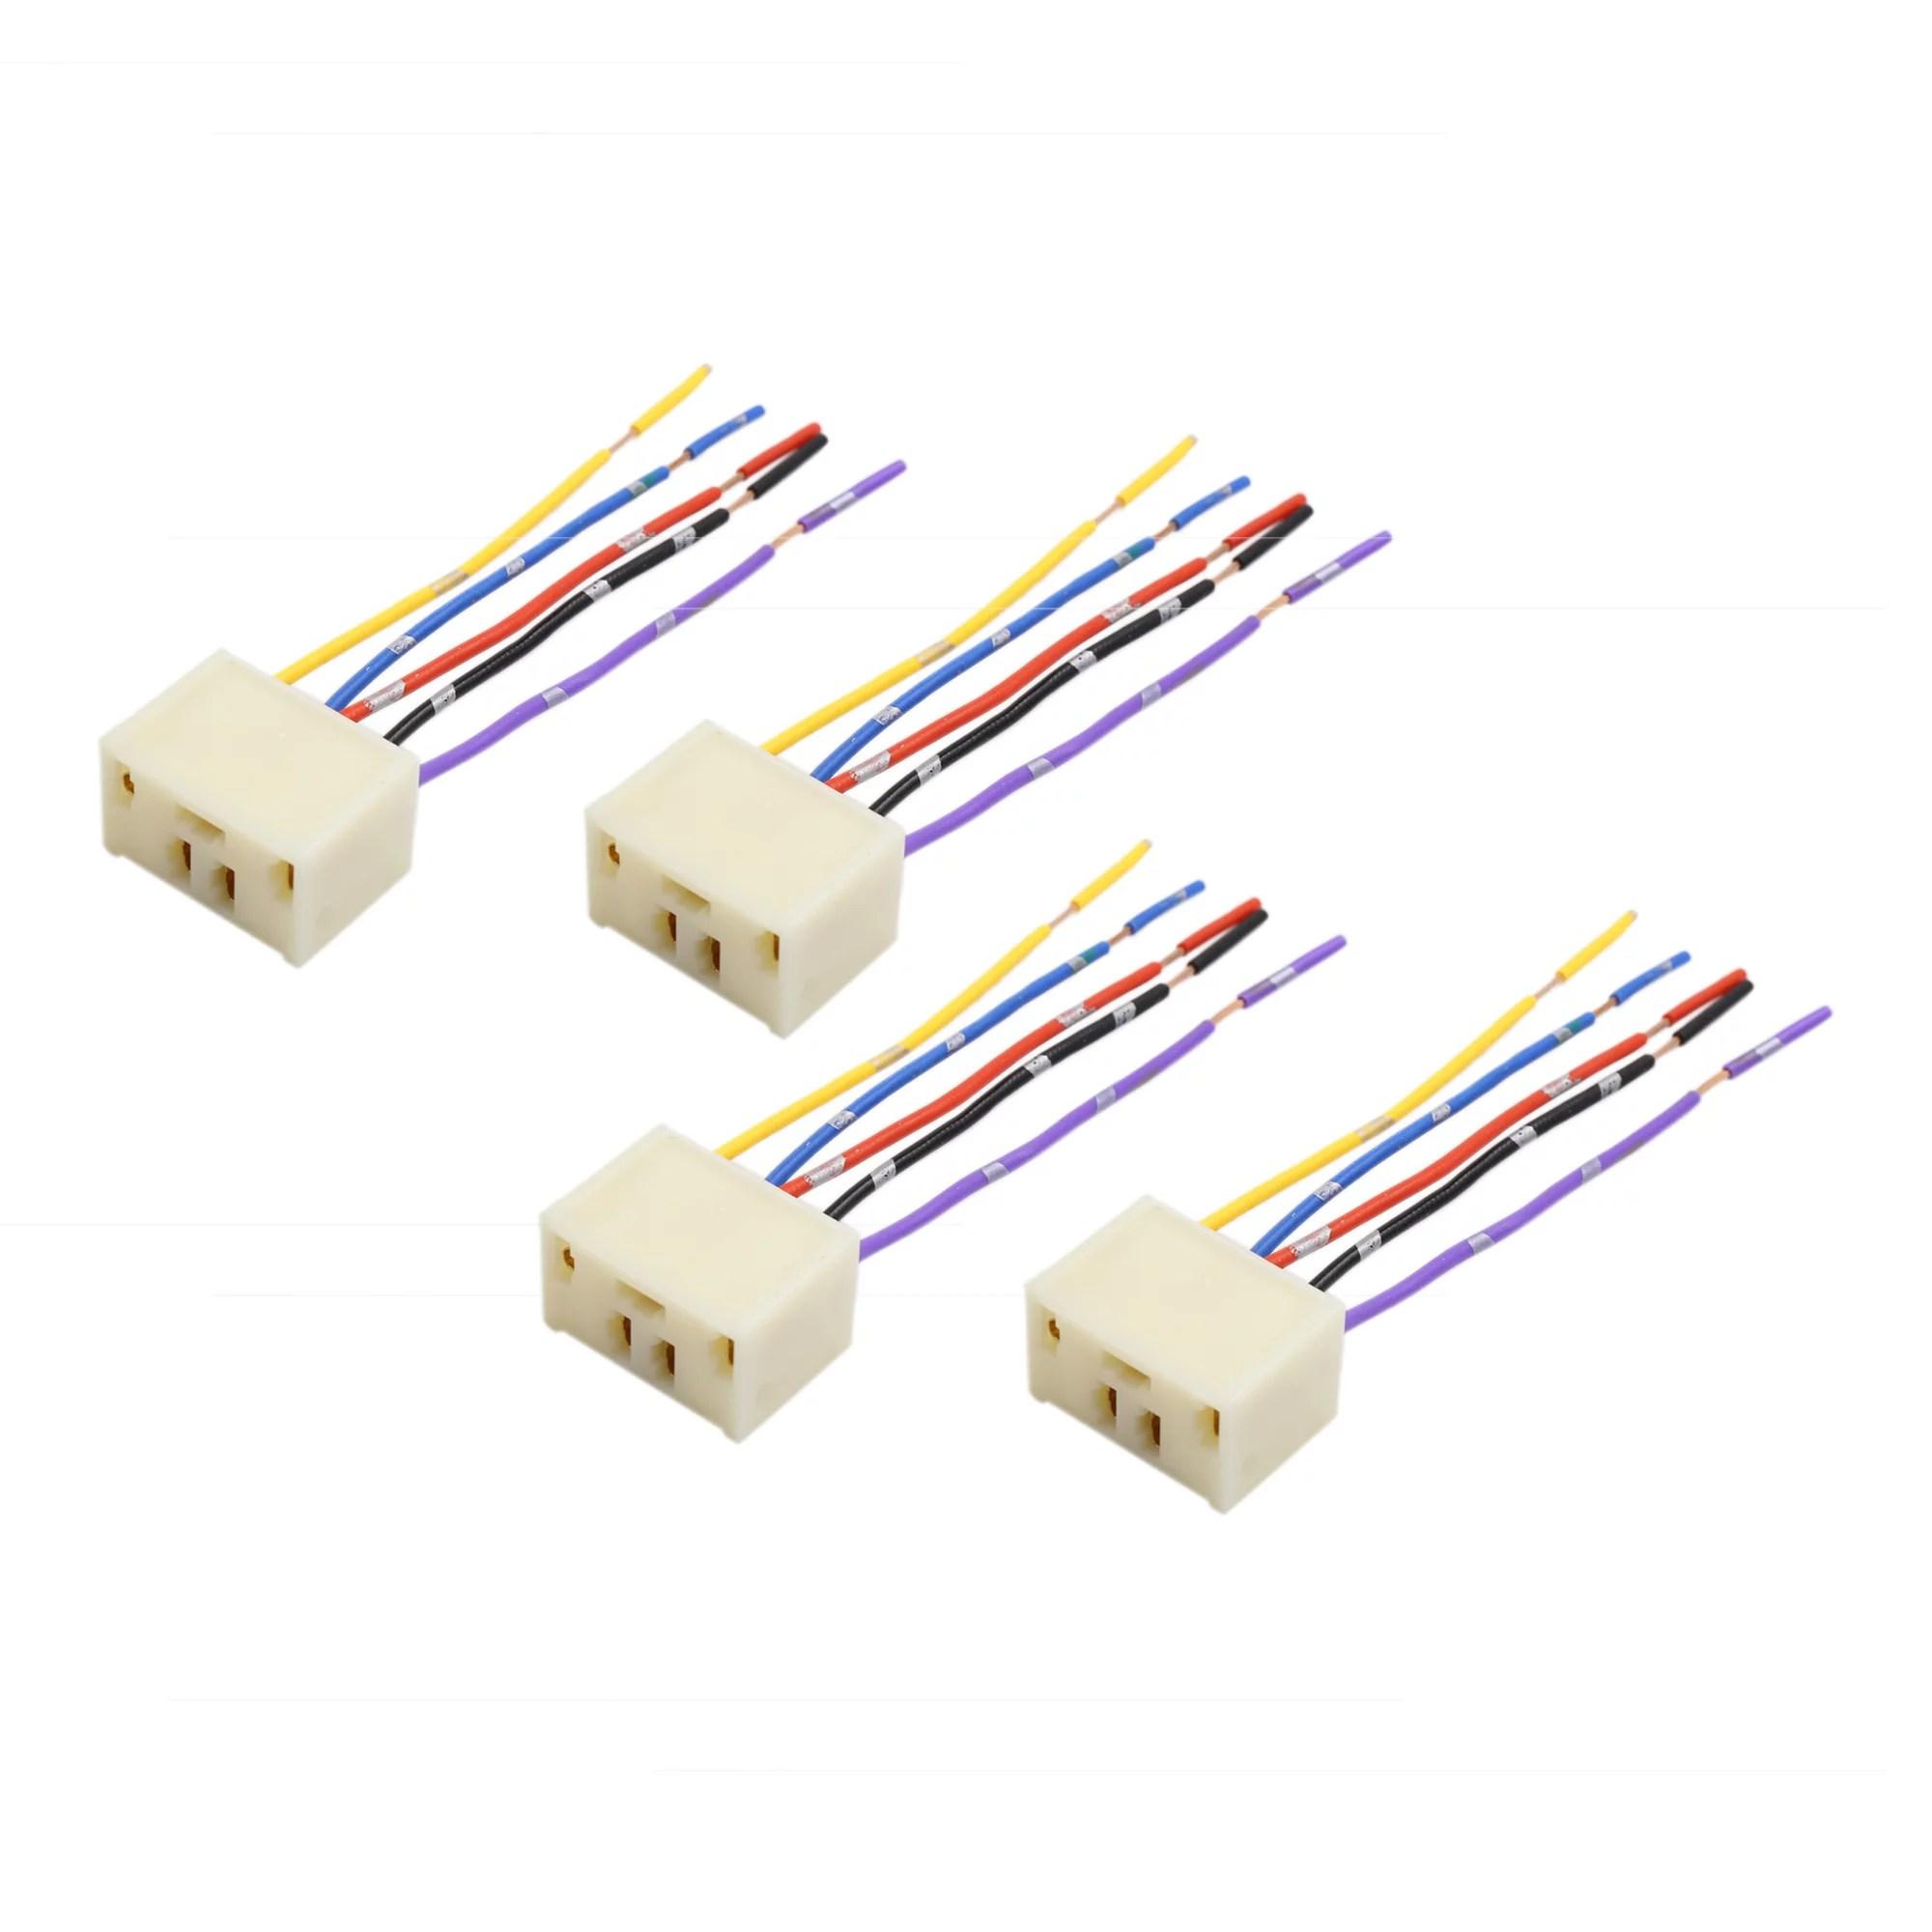 medium resolution of 4pcs dc 12v 5 pin car power window switch socket wiring harness plug adapter walmart canada